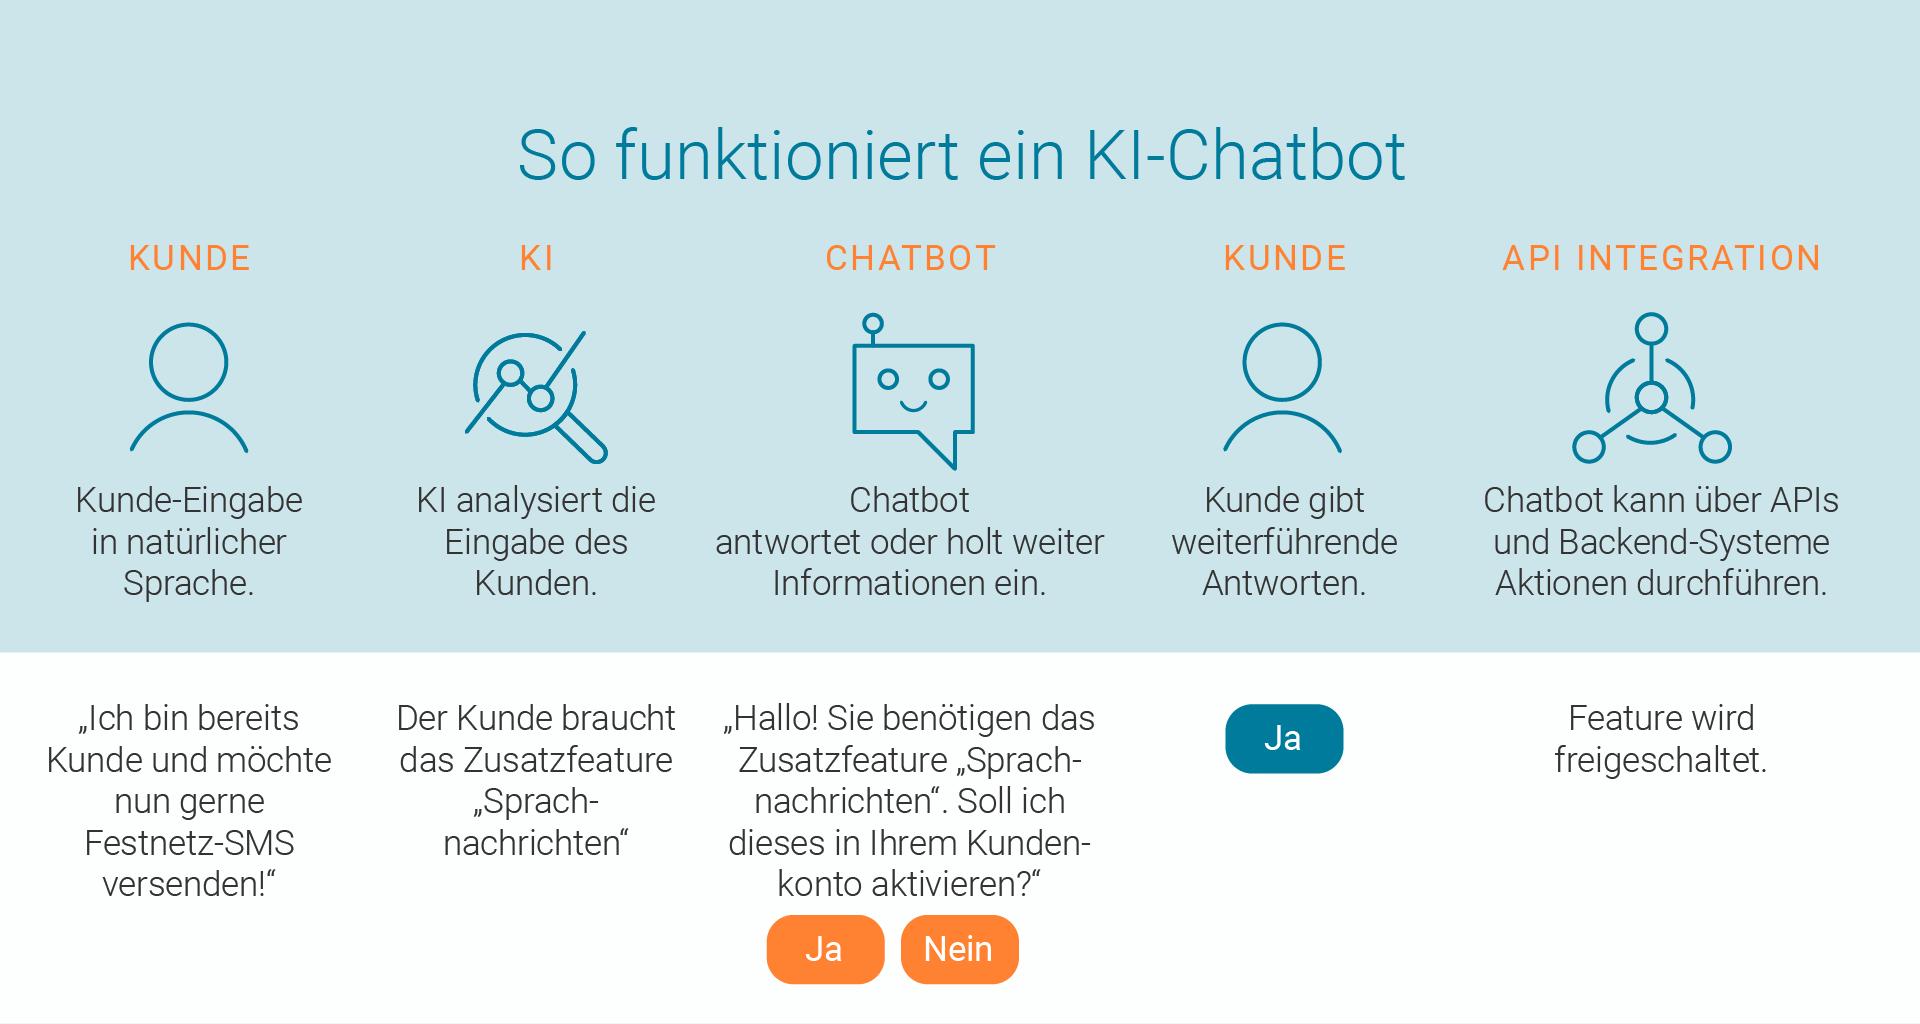 LINK Mobility - so funktioniert ein KI Chatbot